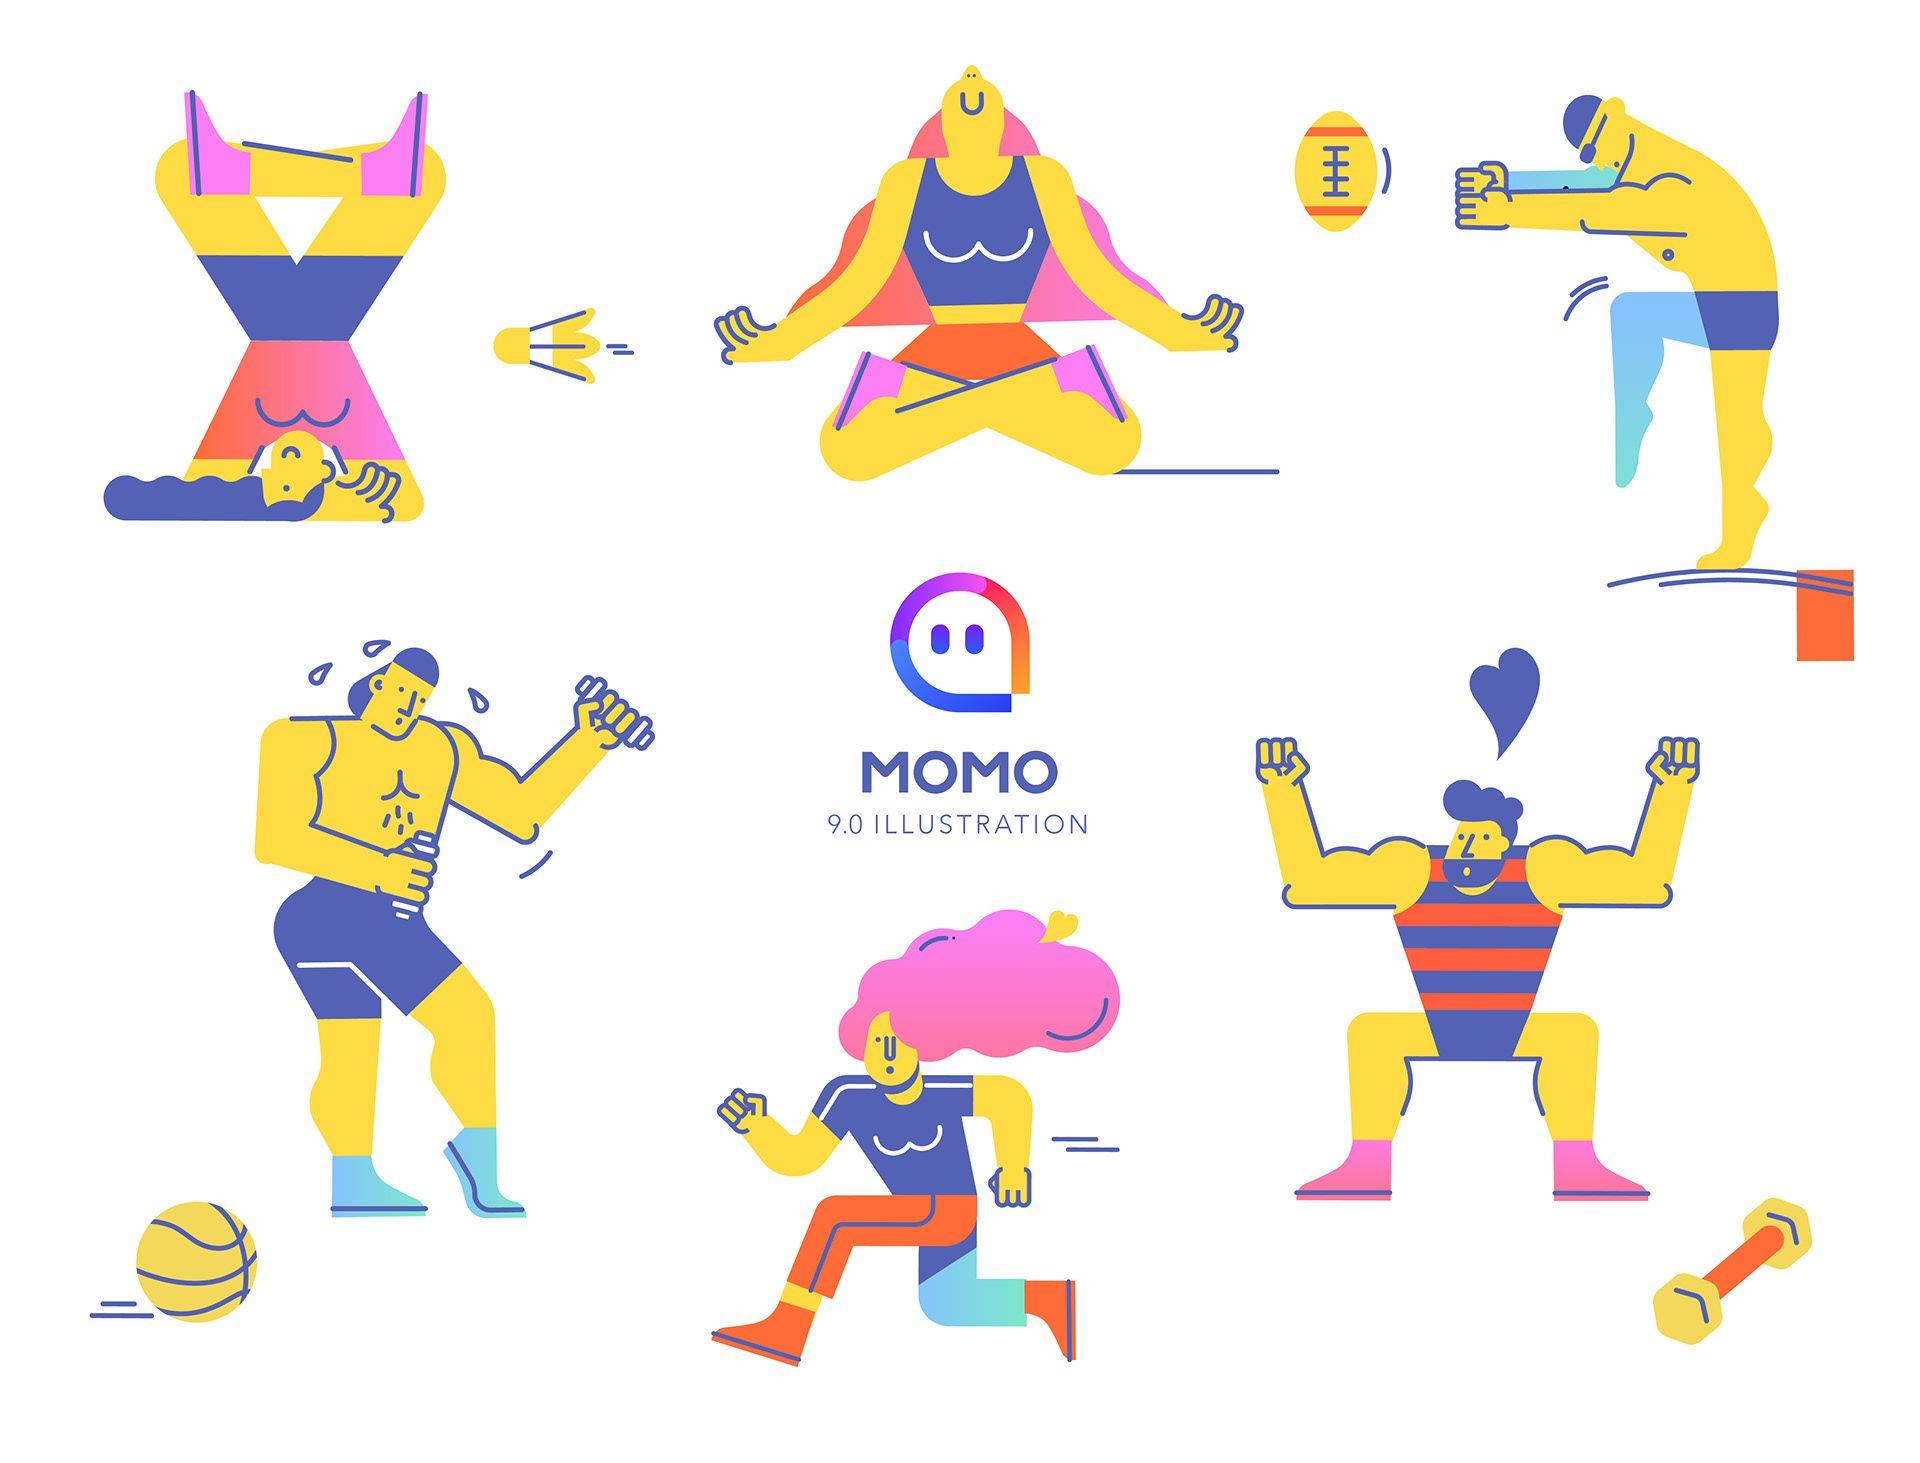 Momo App 9.0 Version Illustration on Behance Momo app